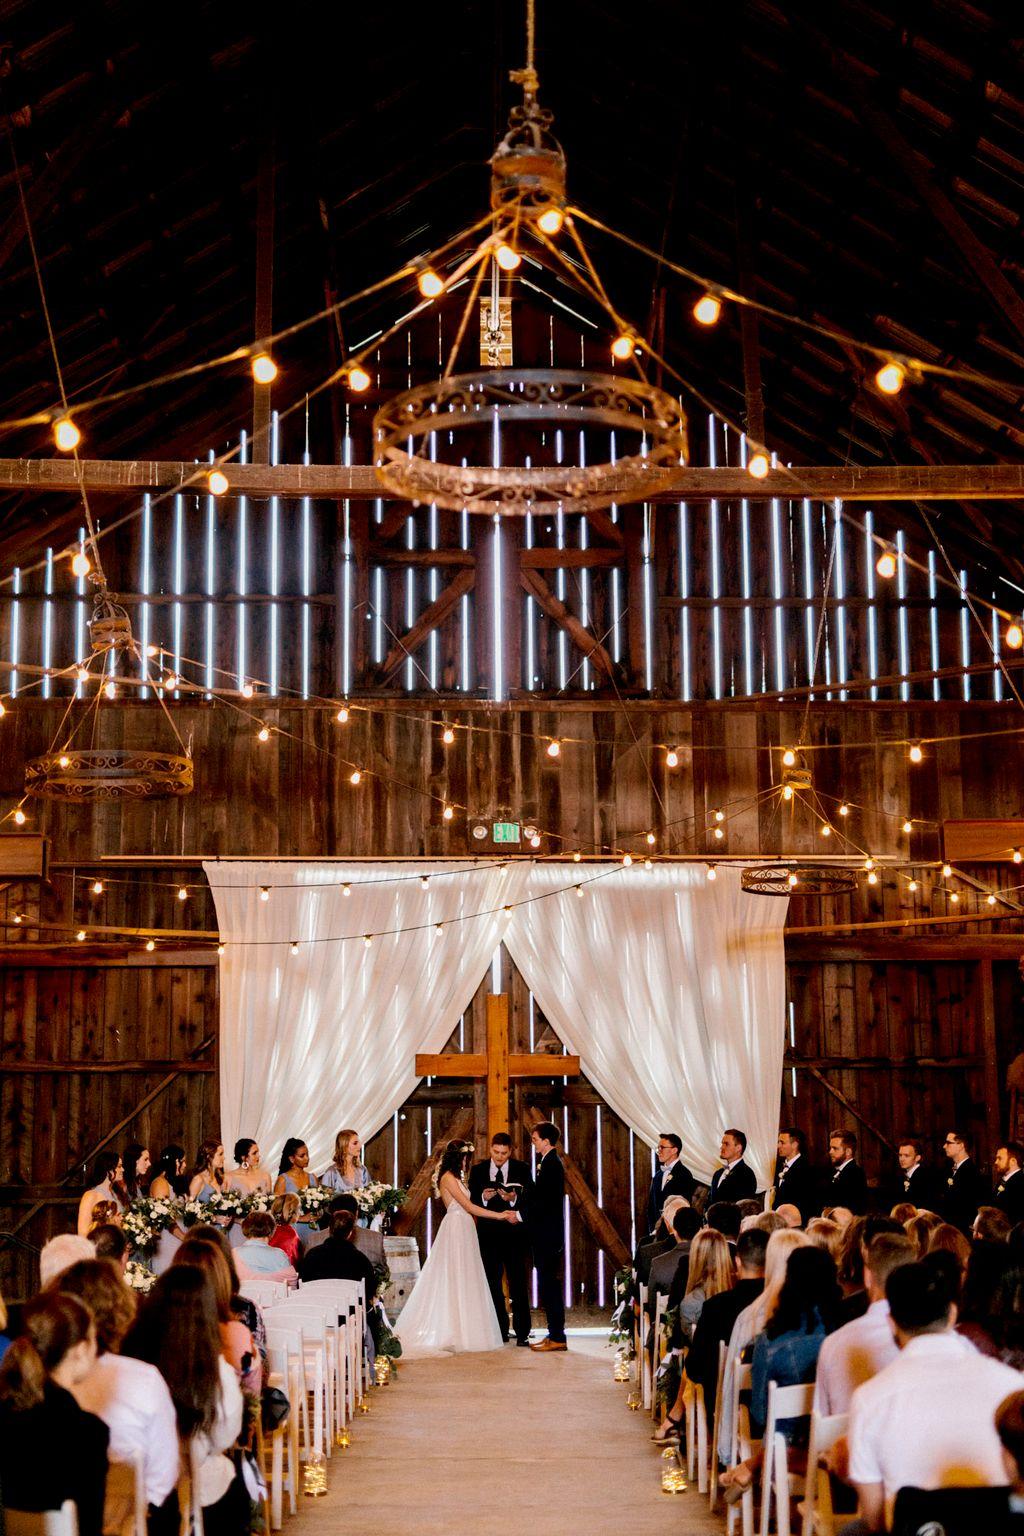 Rainy Barn Wedding